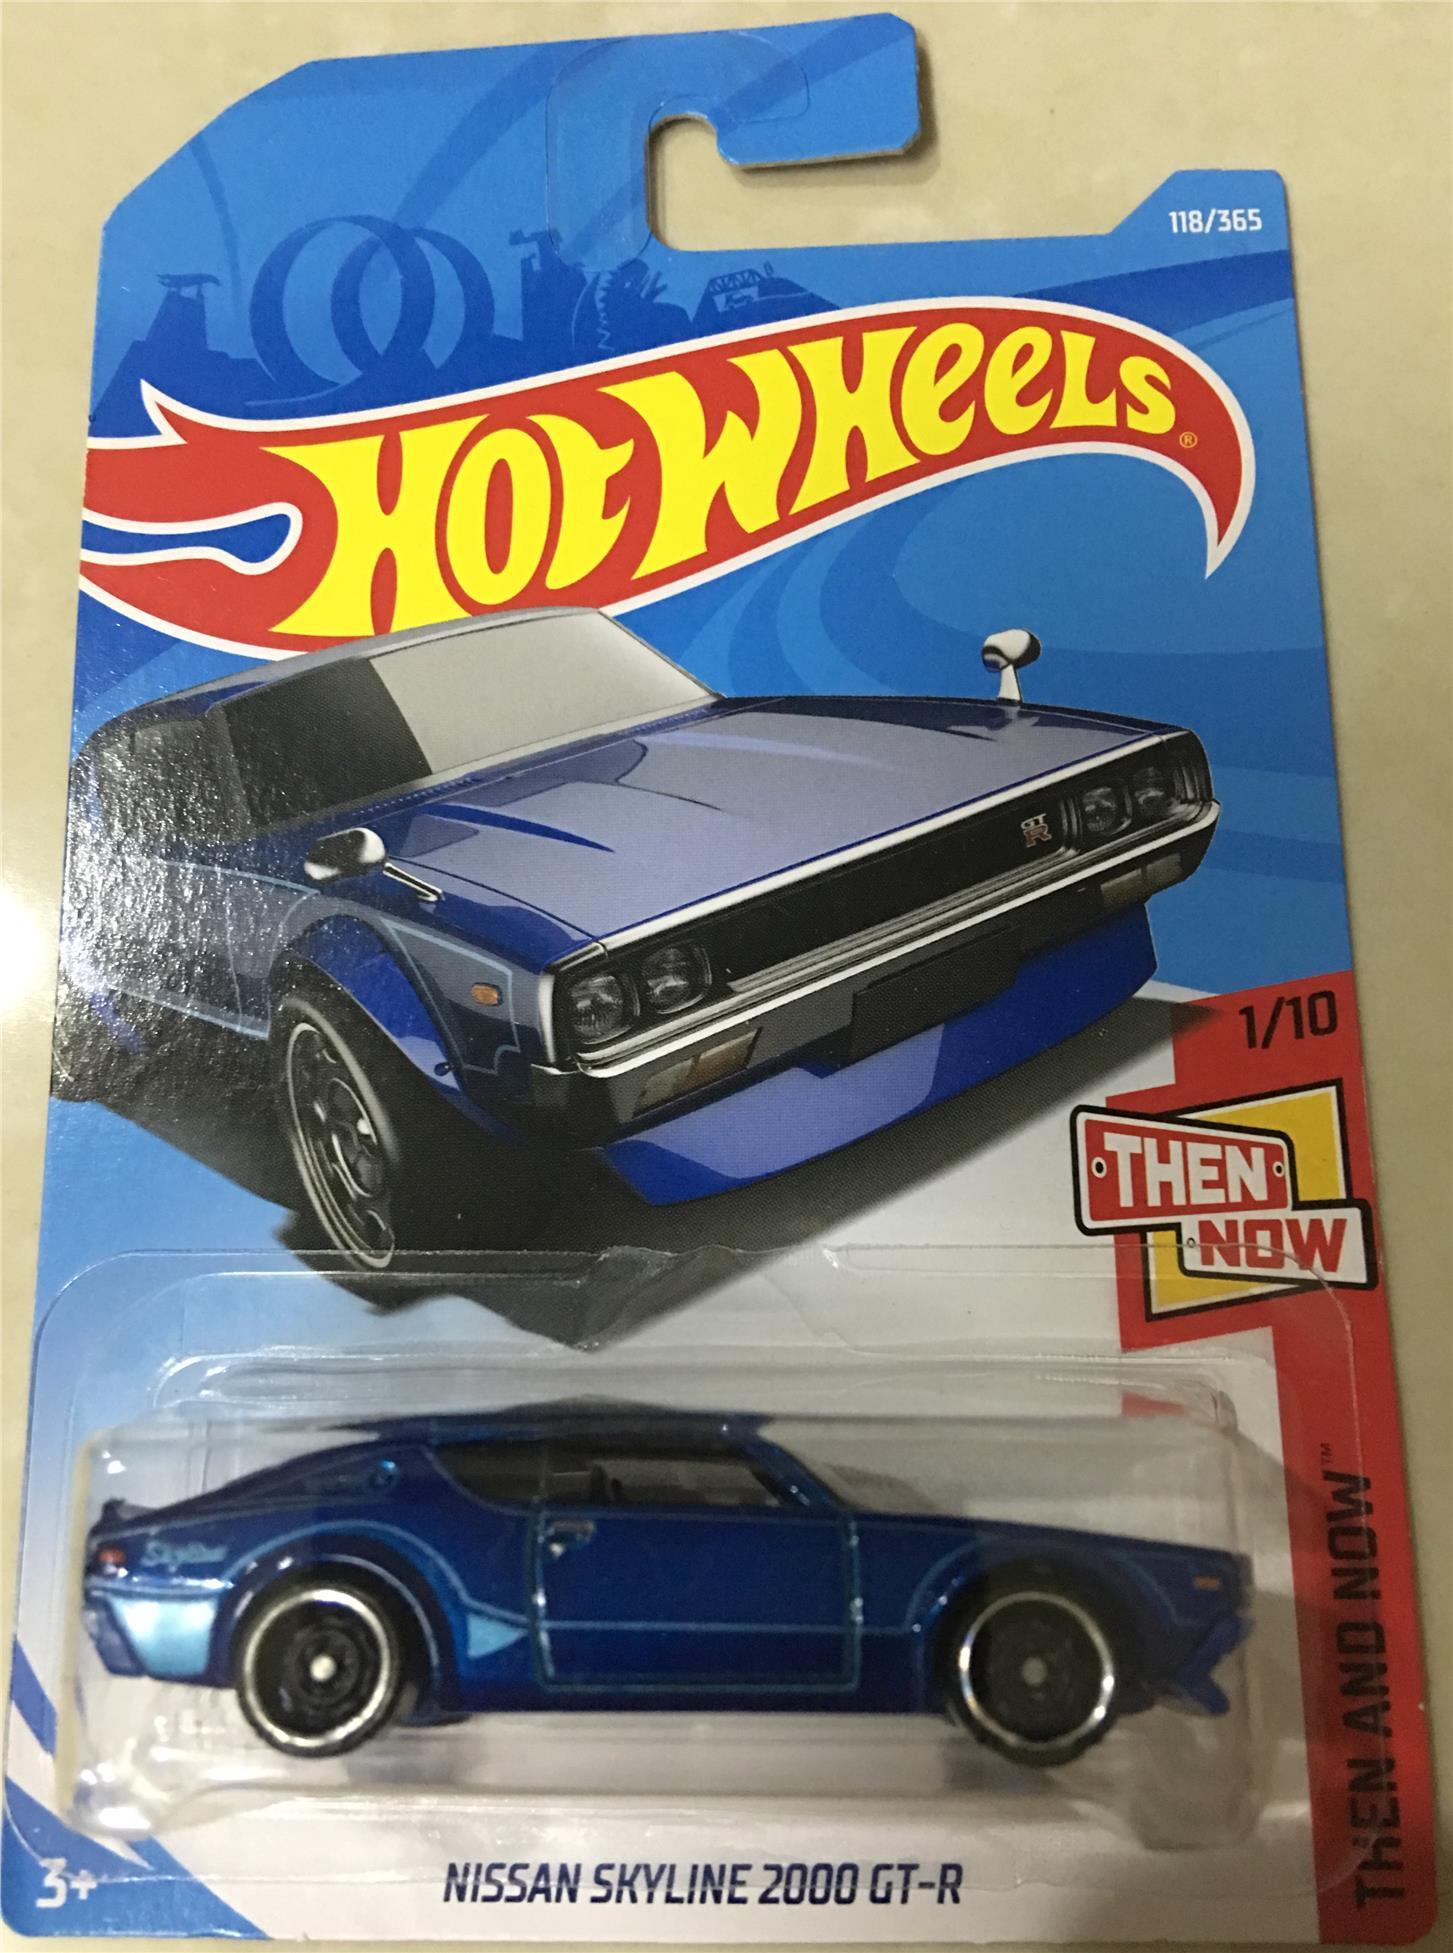 Hotwheels Nissan Skyline 2000 Gt R End 1 23 2020 9 15 Pm